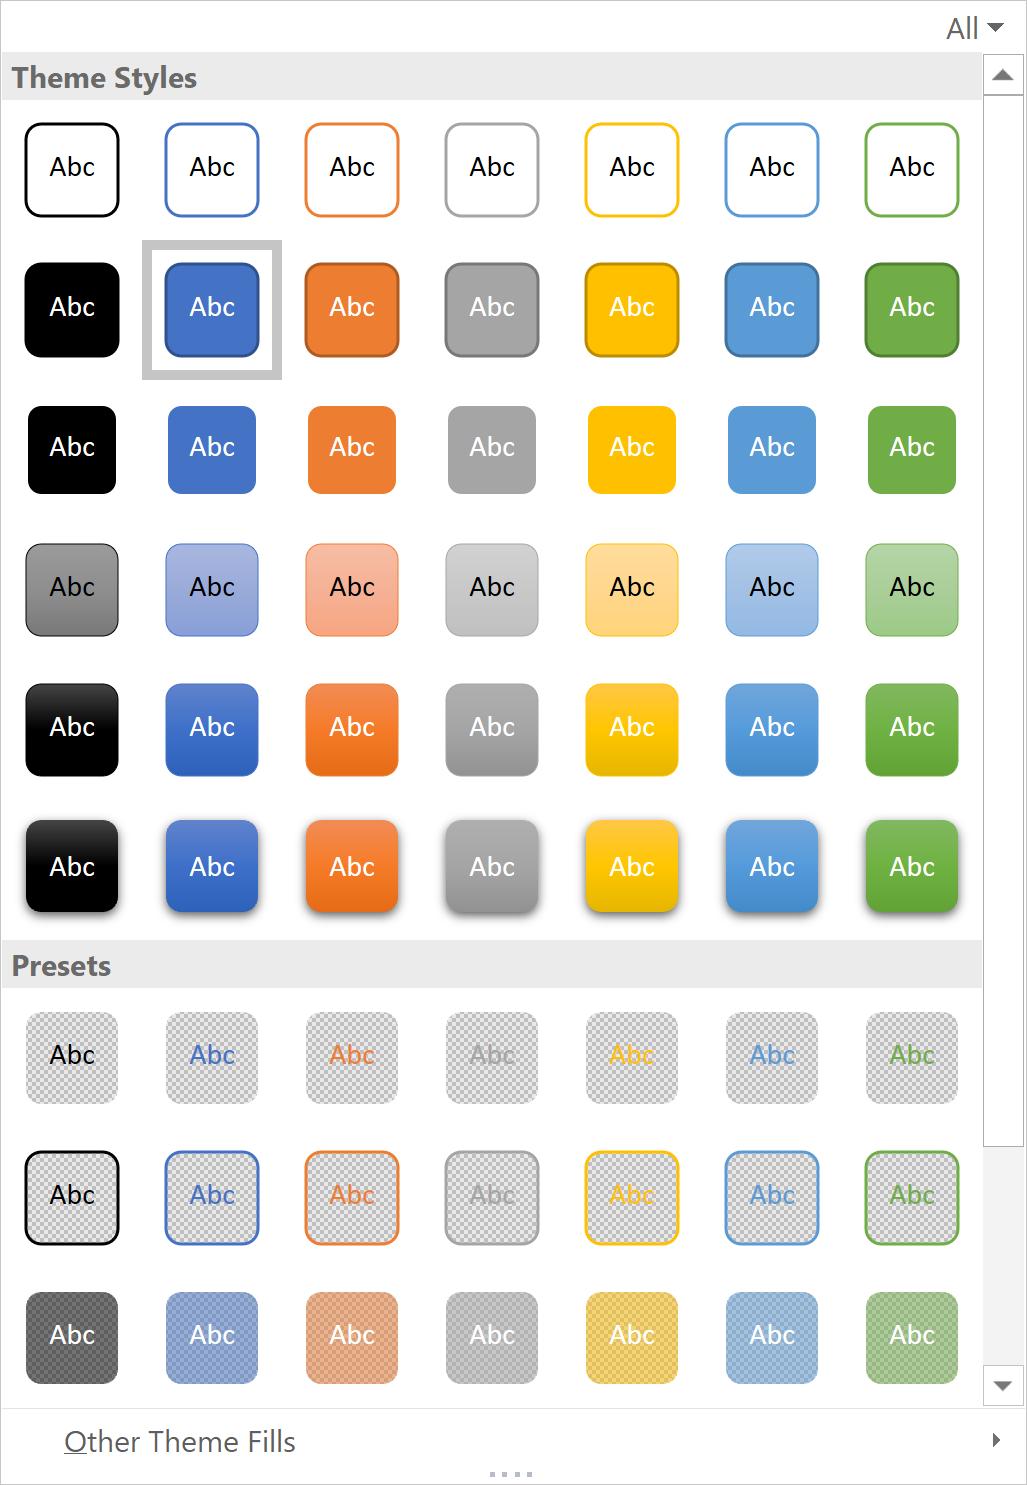 Theme Styles